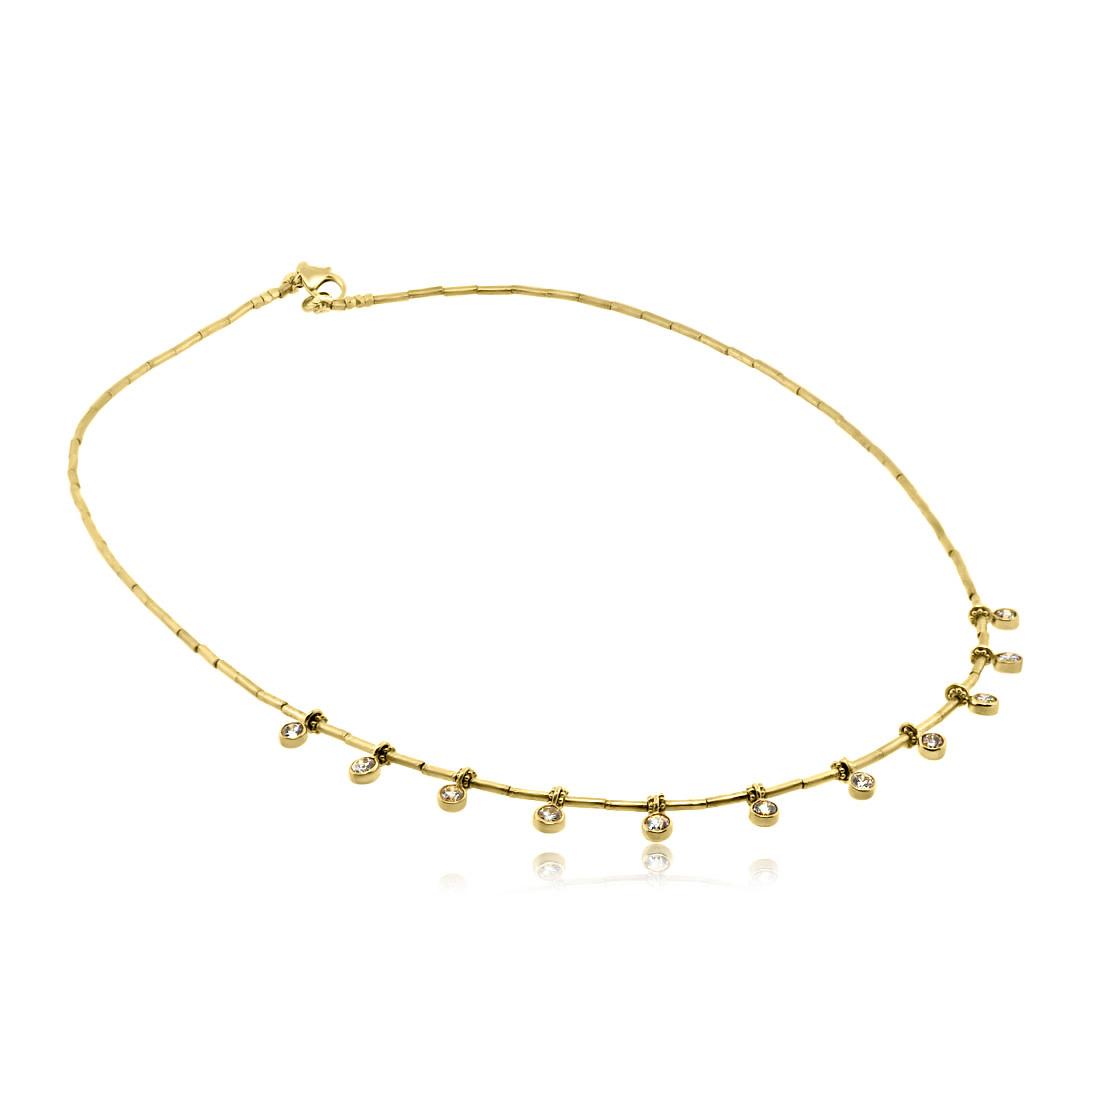 Trabert Goldsmiths Champagne Diamond Charm Gold Necklace